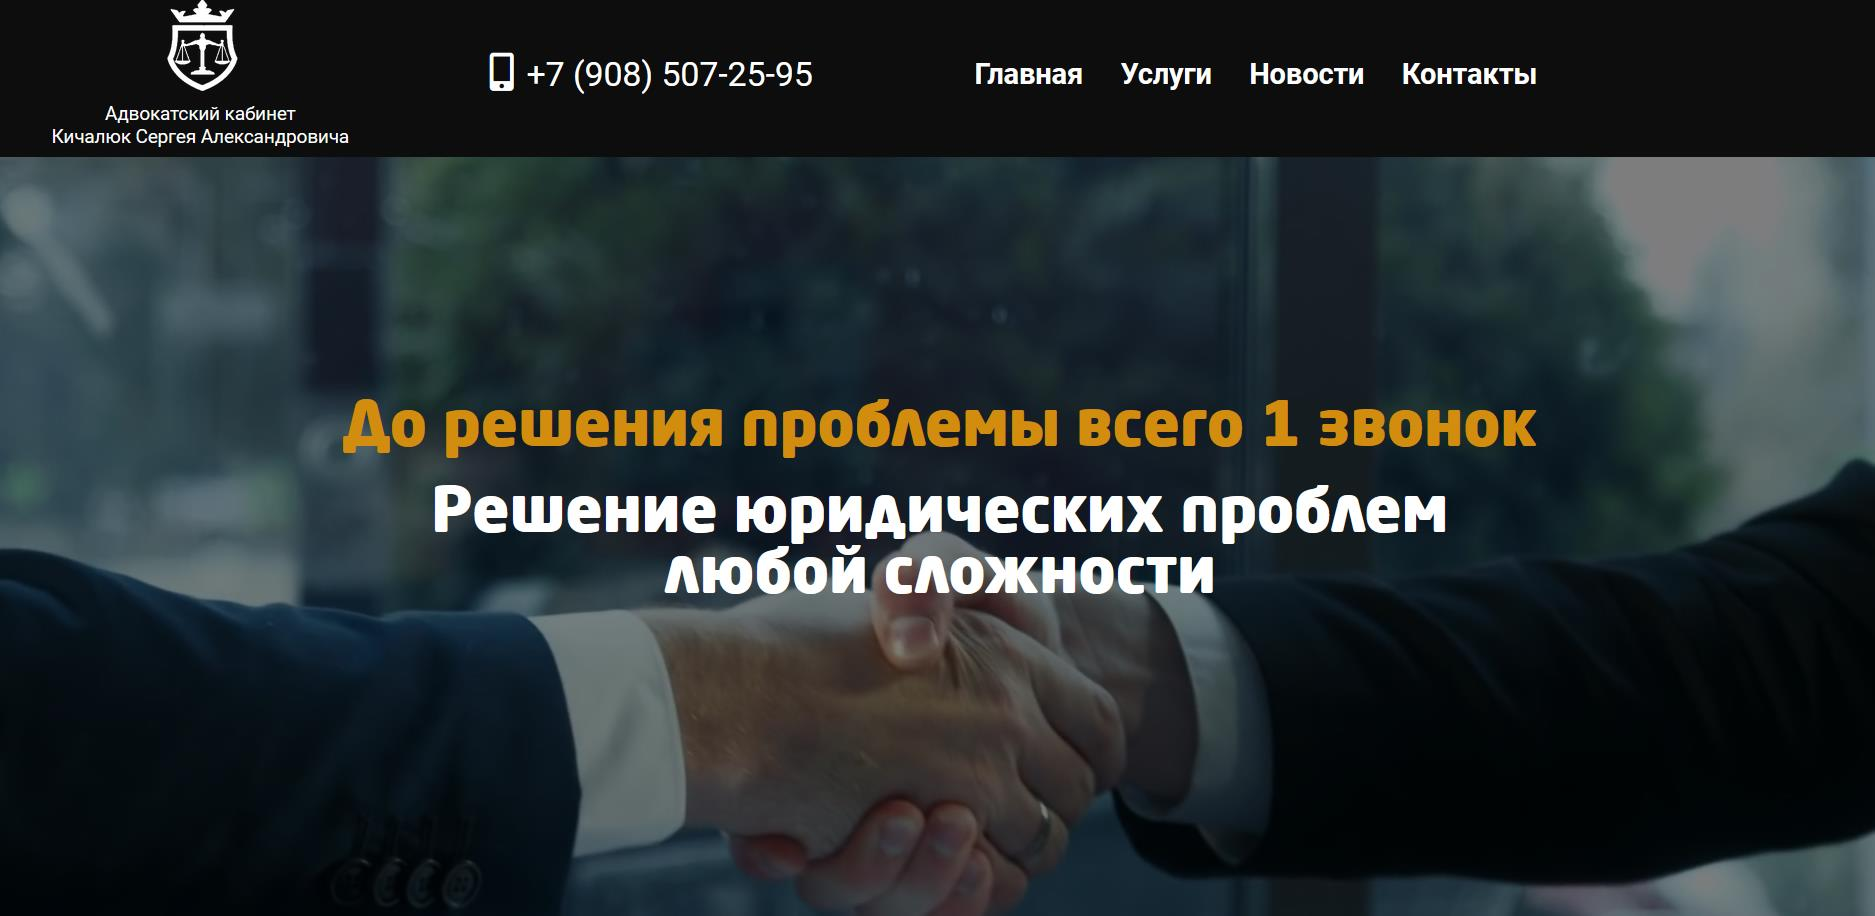 Для адвоката в Ростове сайт сделали. вот портфолио